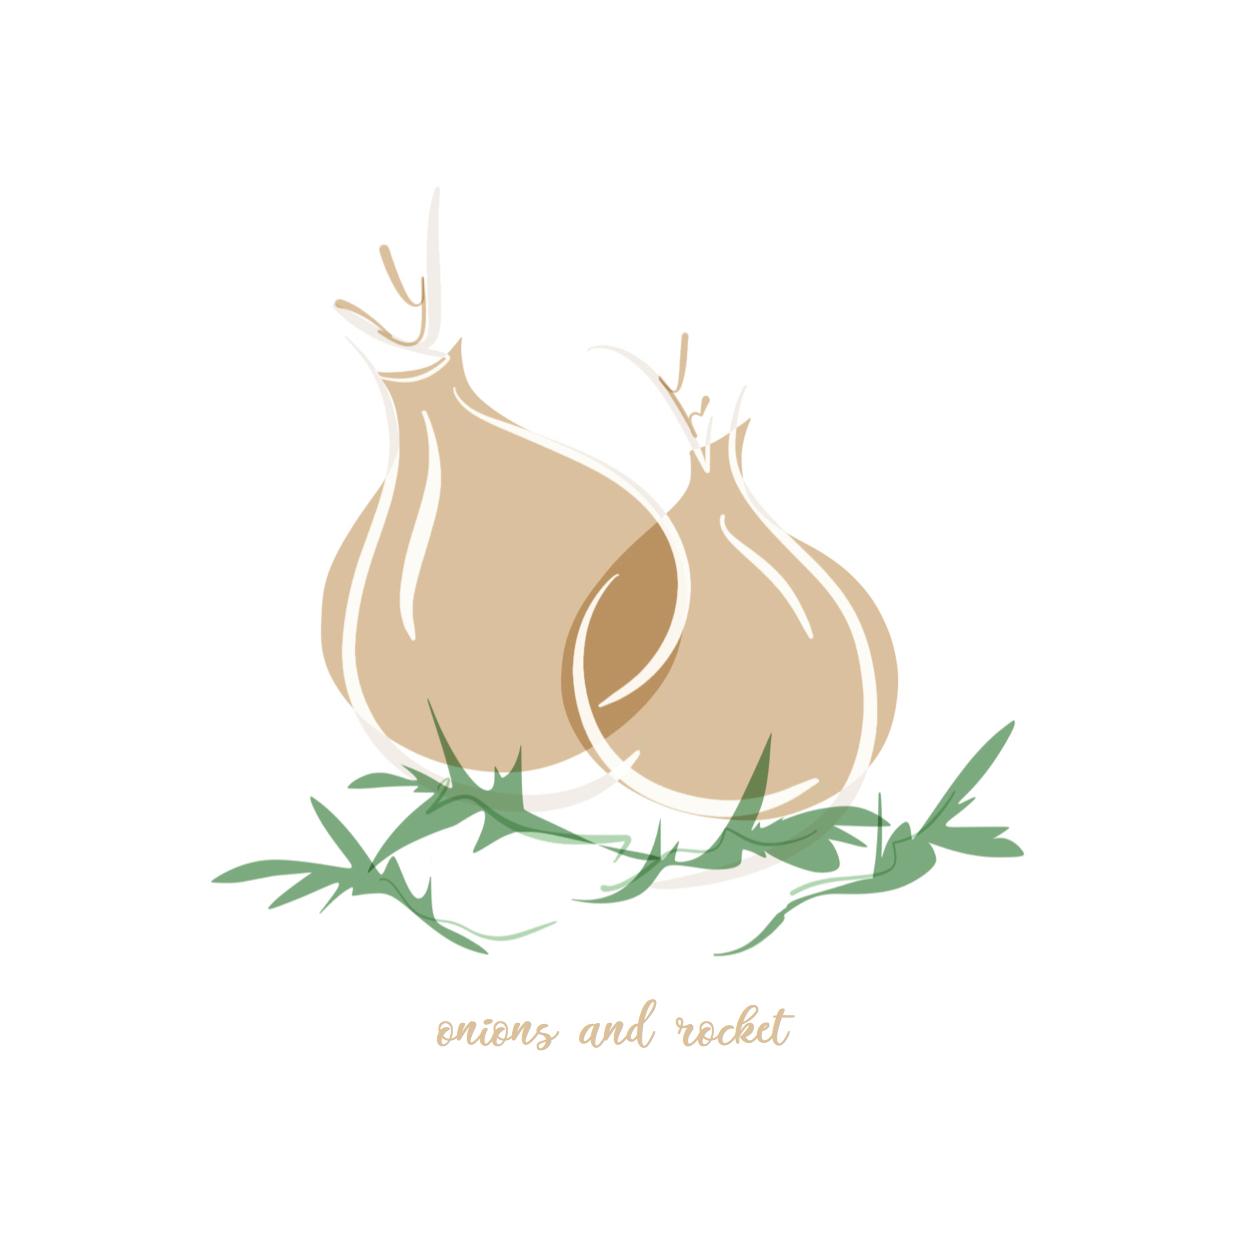 Onions and Rocket Illustration.jpg